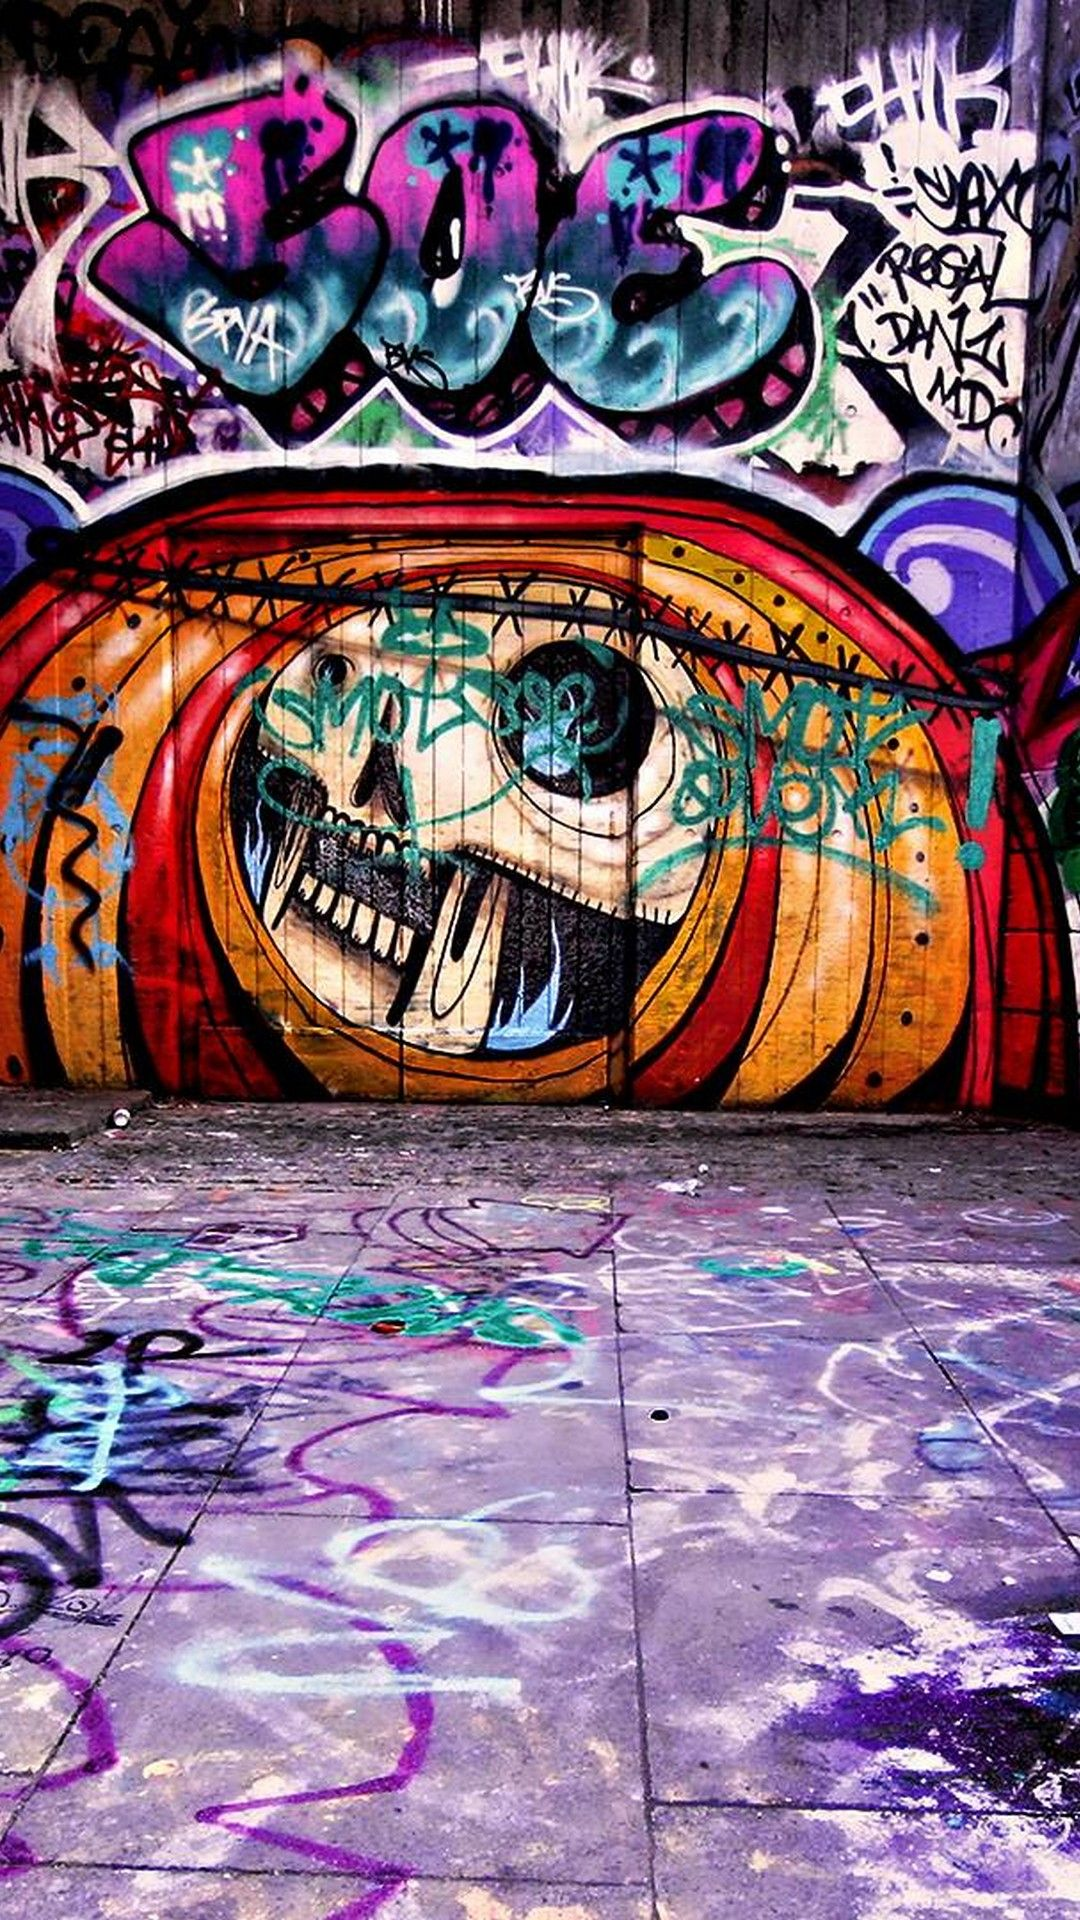 iPhone X Wallpaper Graffiti วอลเปเปอร์โทรศัพท์